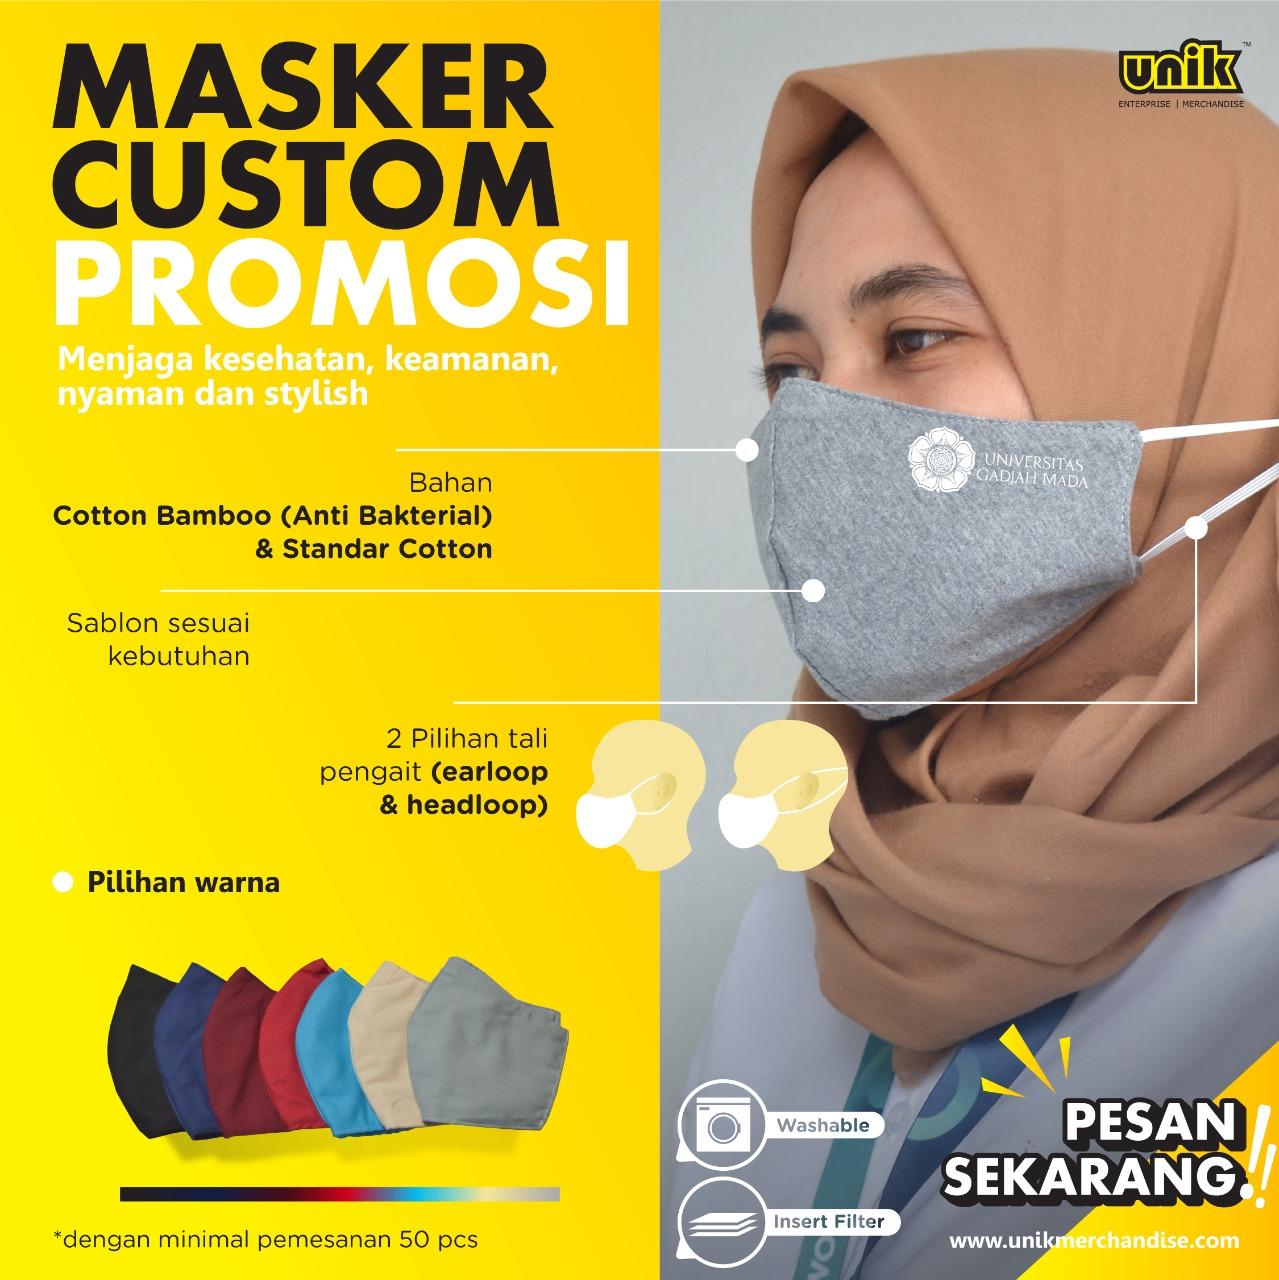 Masker Promosi